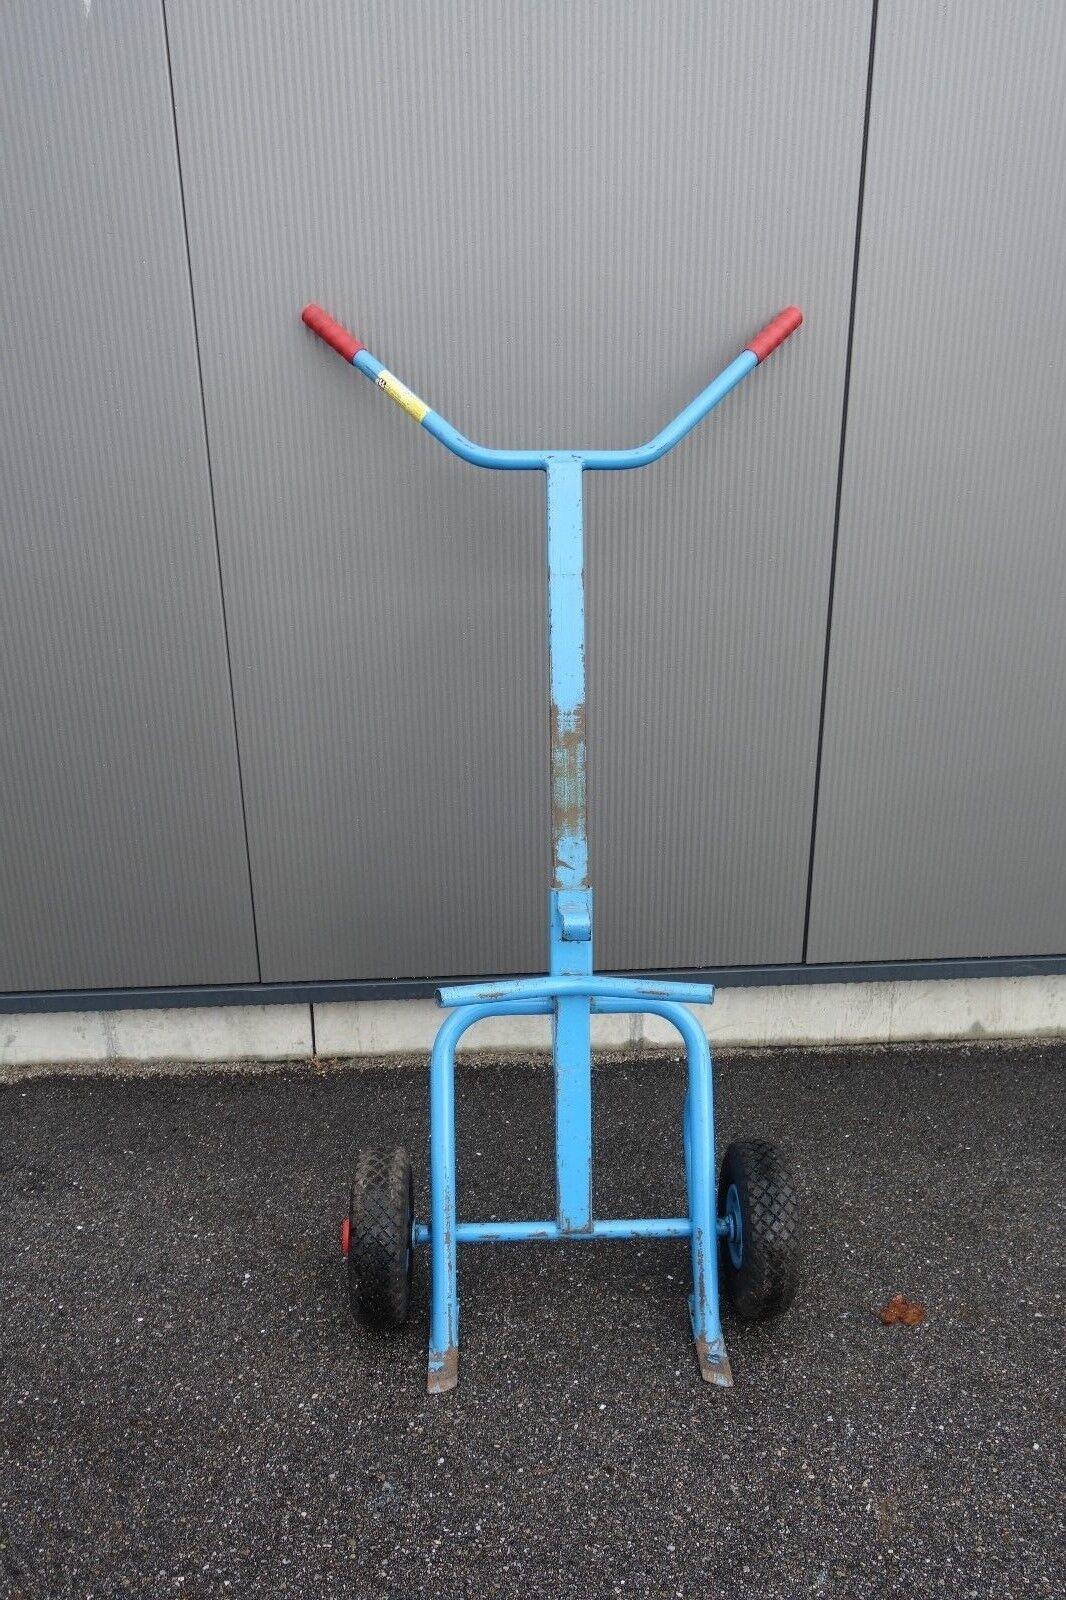 Fetra fasskarre fasskarre Fetra Chariot de transport 300 kg pneumatiques fassroller tonneau caisse INCL. TVA ec121e